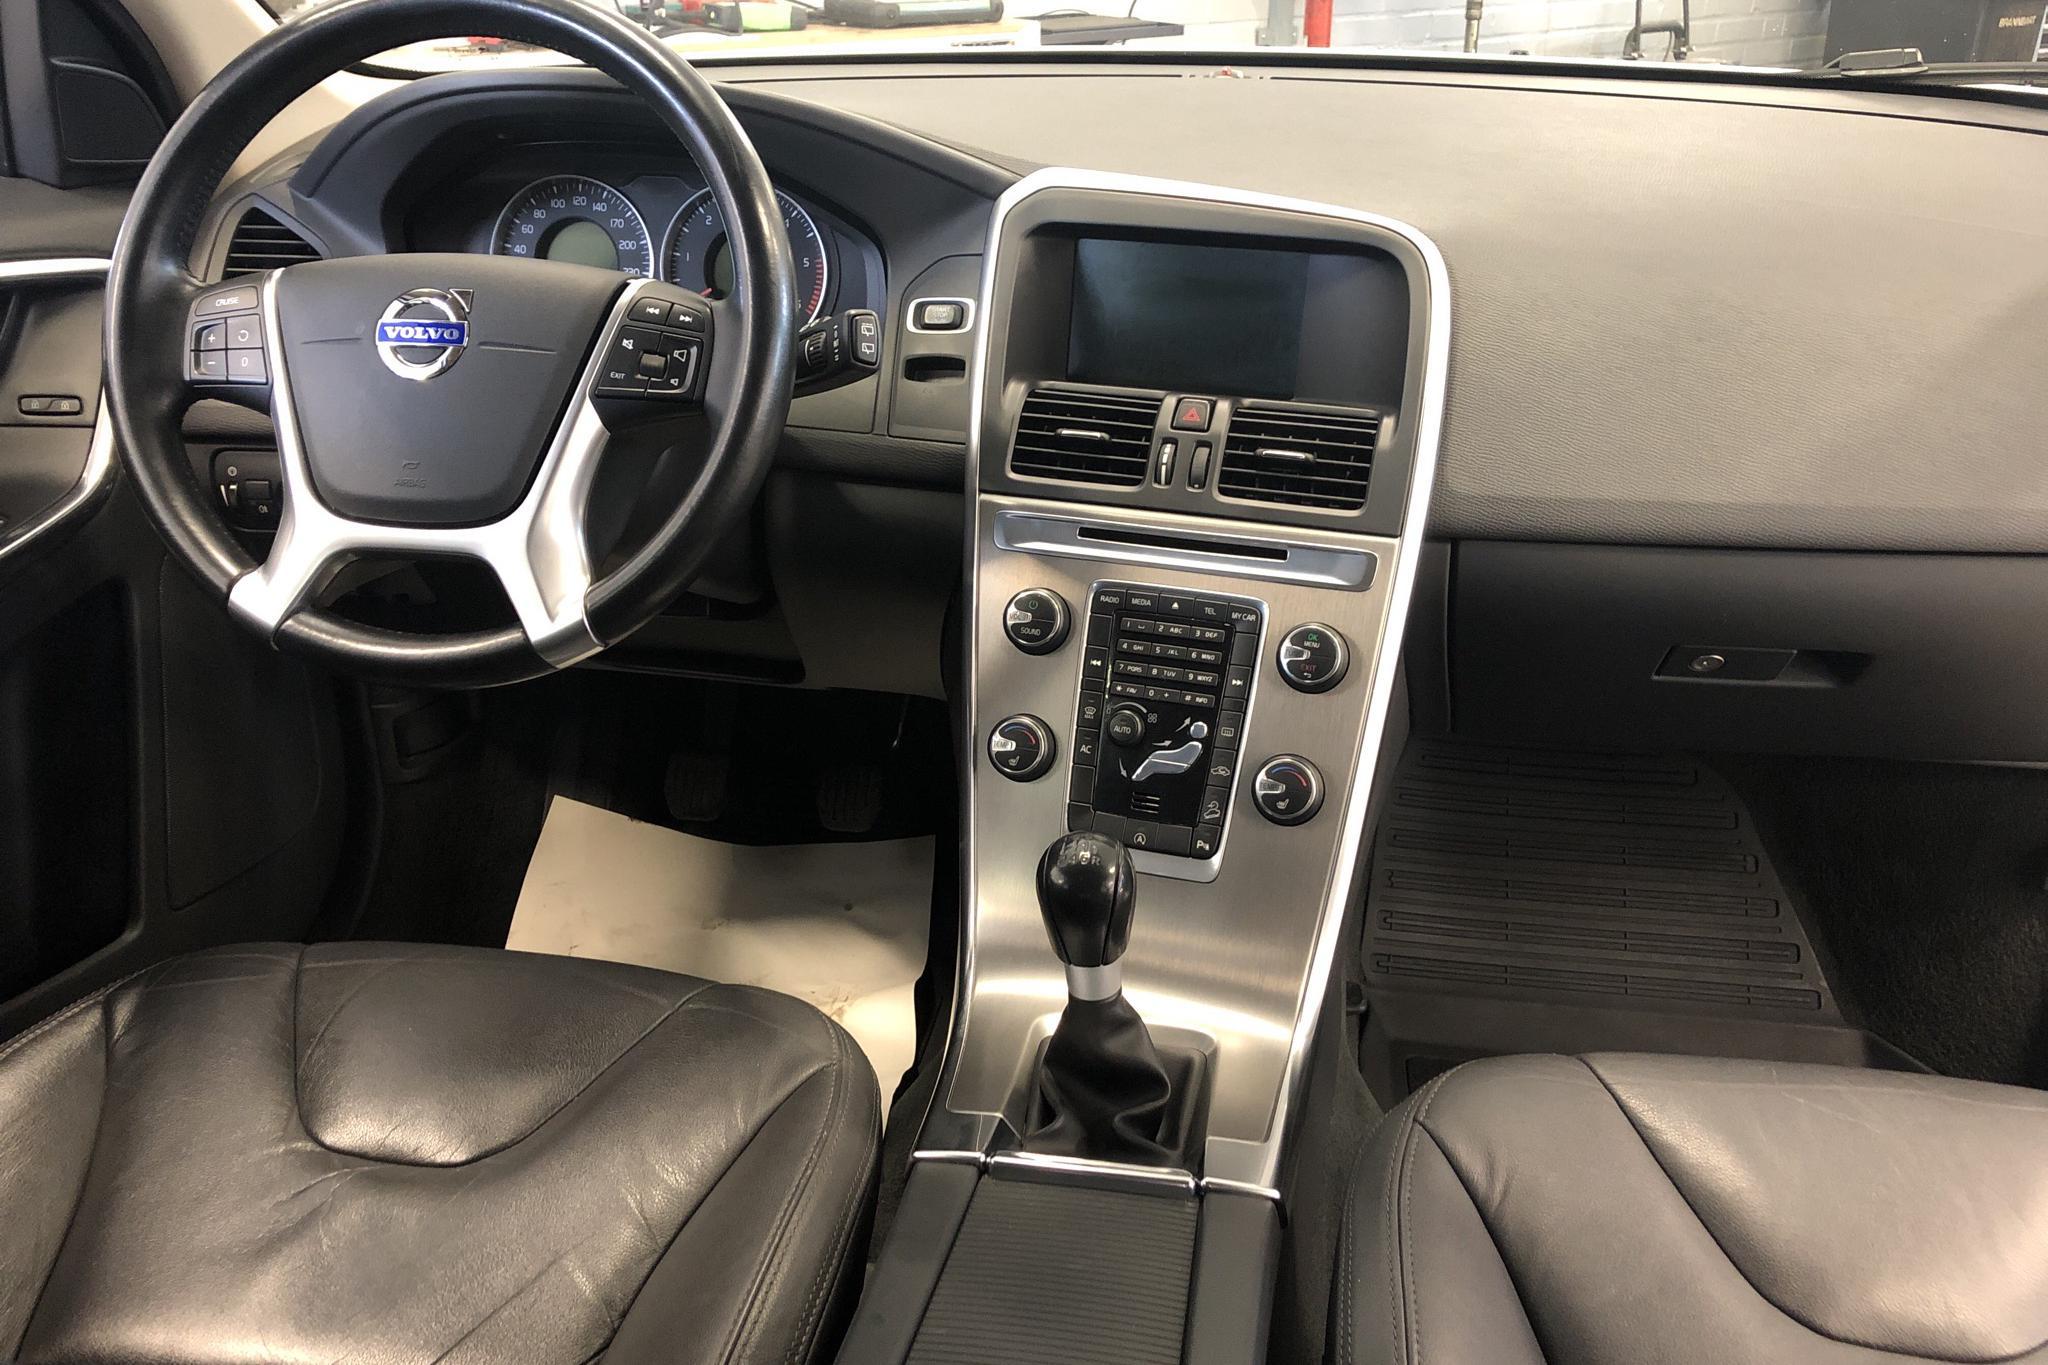 Volvo XC60 D4 AWD (163hk) - 204 980 km - Manual - white - 2013